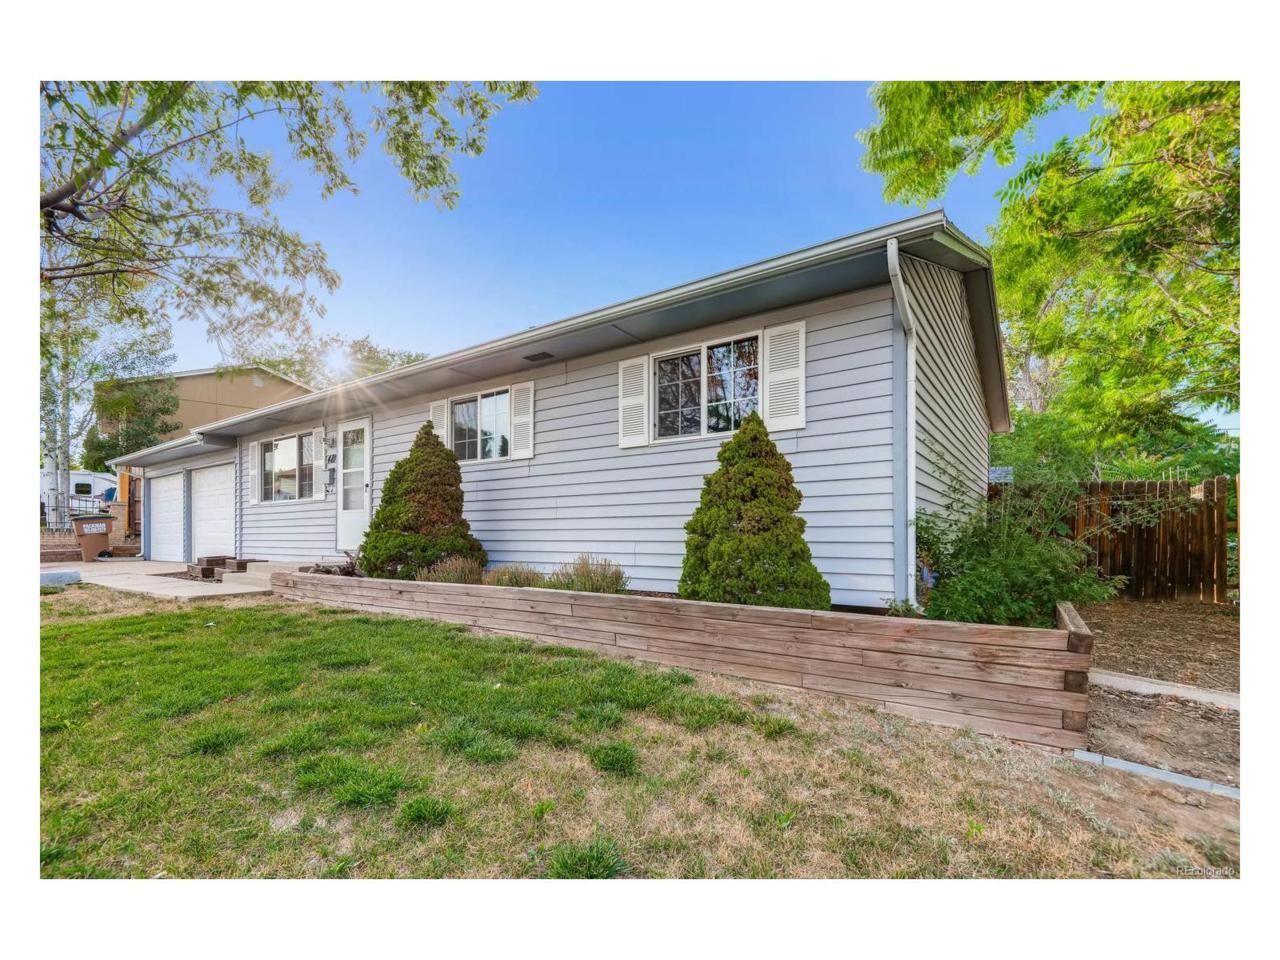 481 W 78th Place, Denver, CO 80221 (MLS #9831195) :: 8z Real Estate